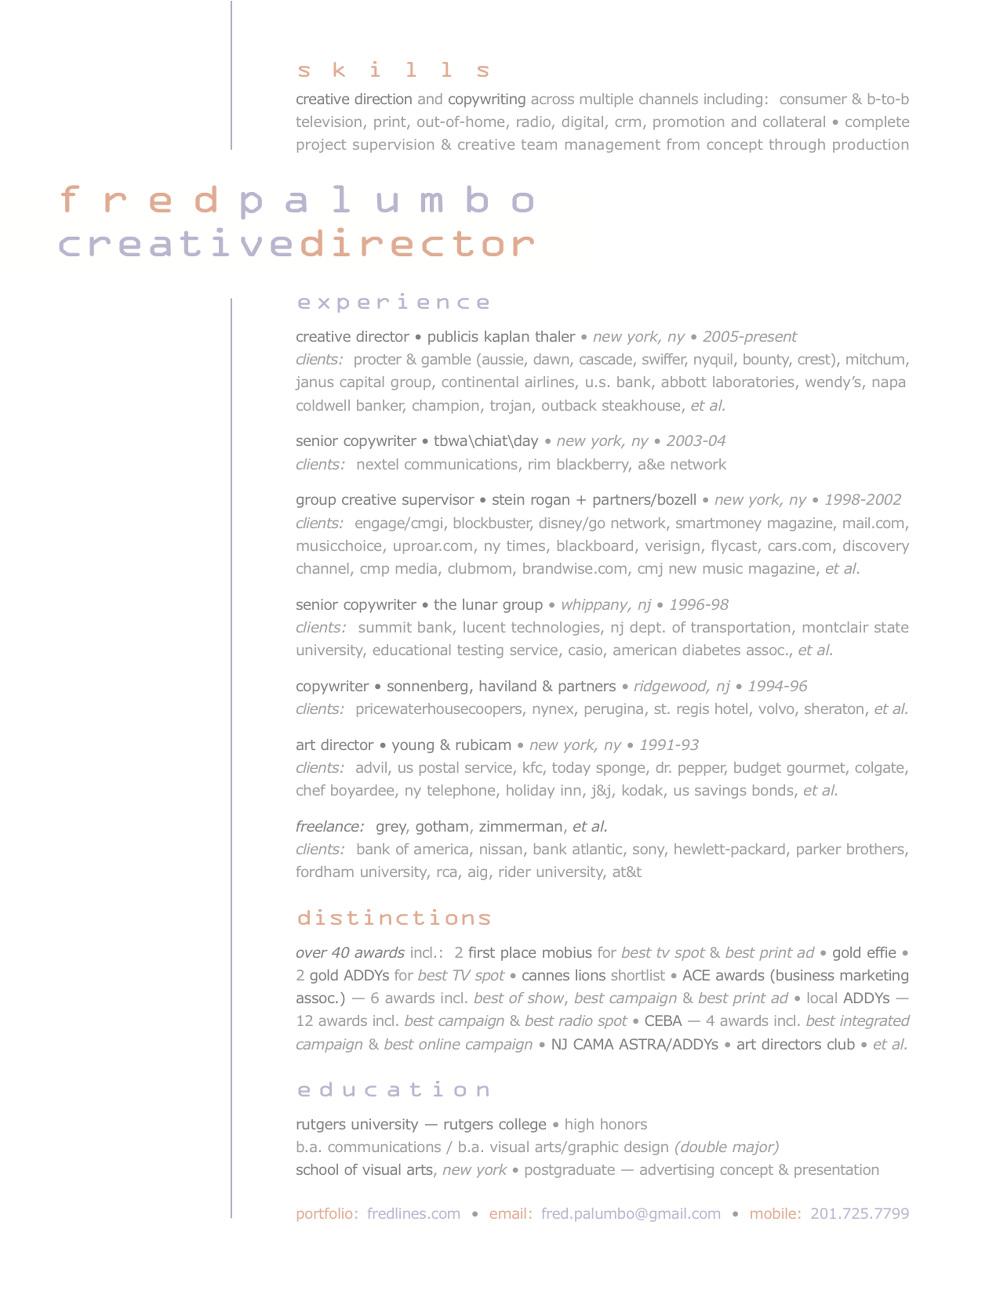 Resume Fred Palumbo Creative Director Copywriter